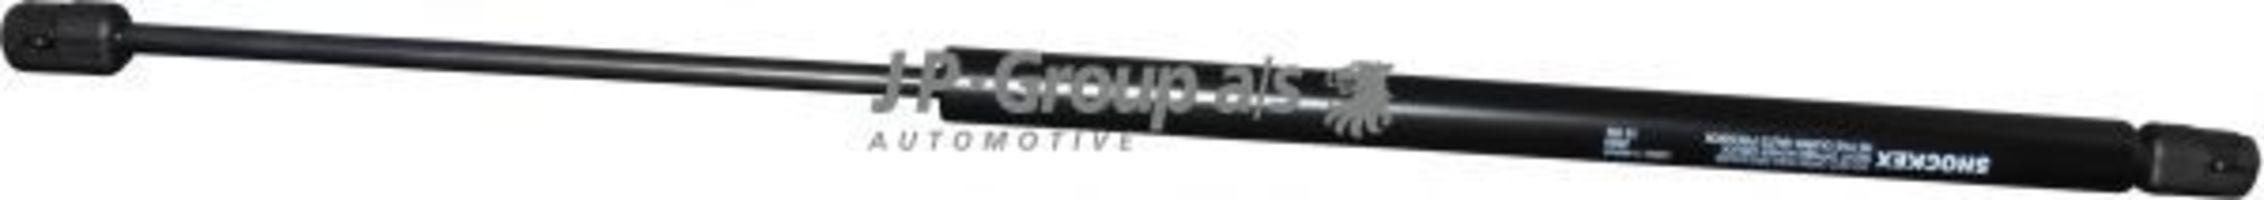 Амортизатор багажника JP GROUP 1581202700